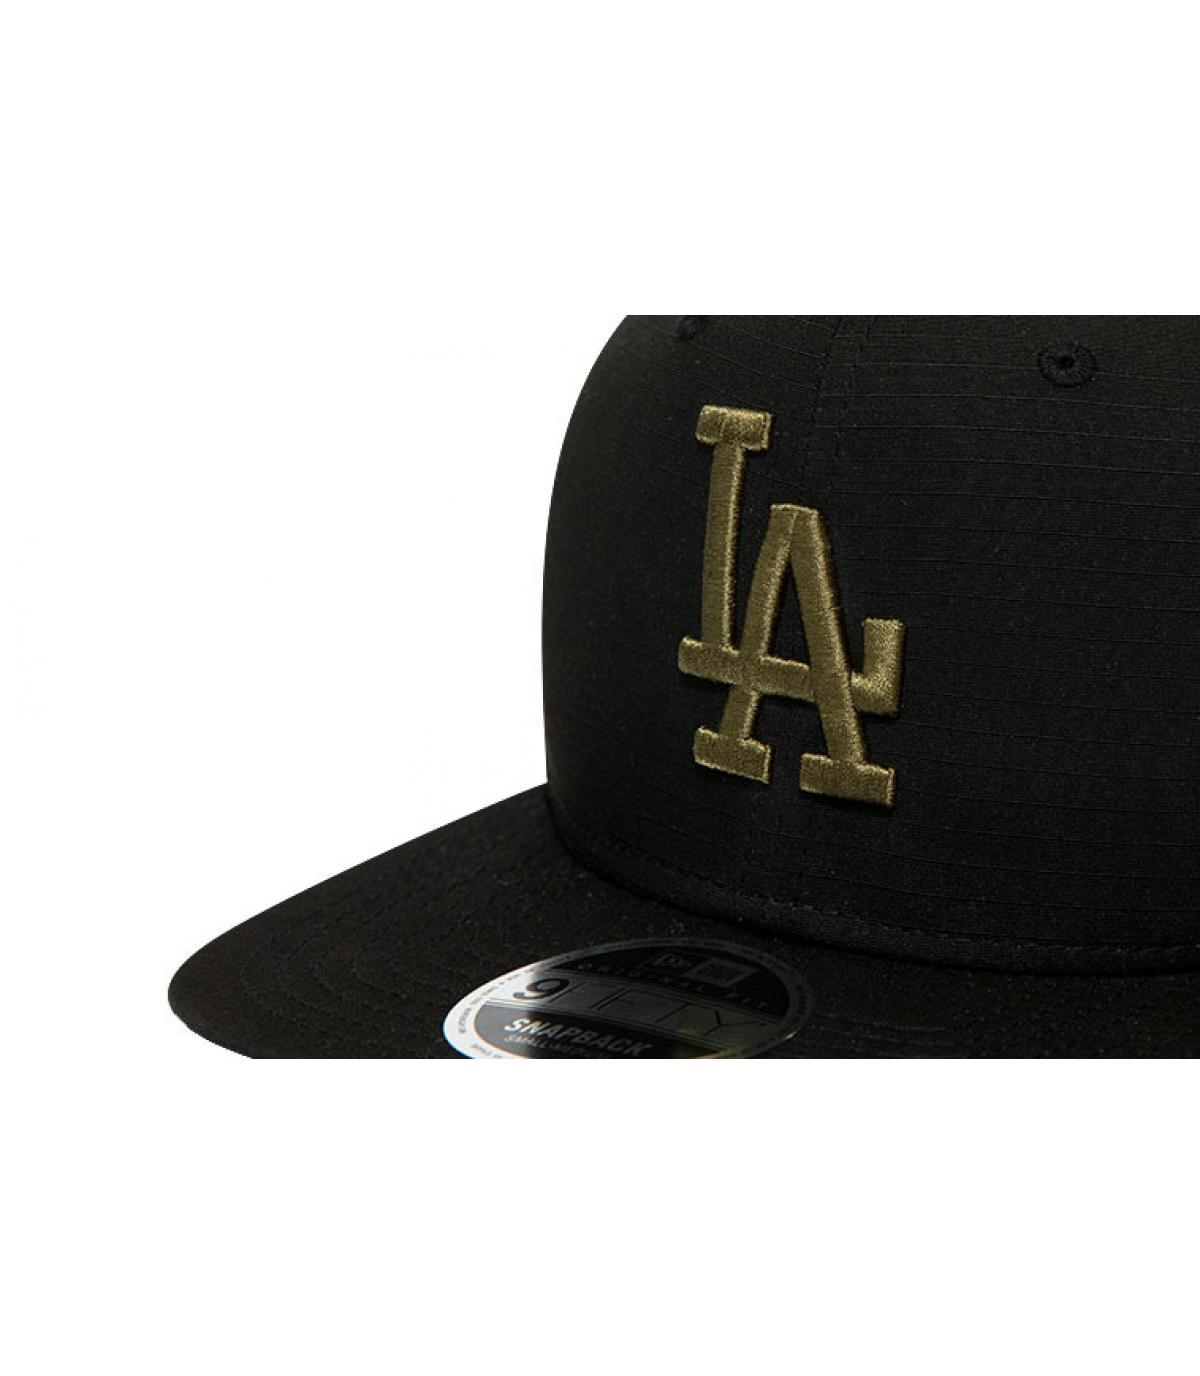 Détails Snapback MLB Utility LA 950 black olive - image 3